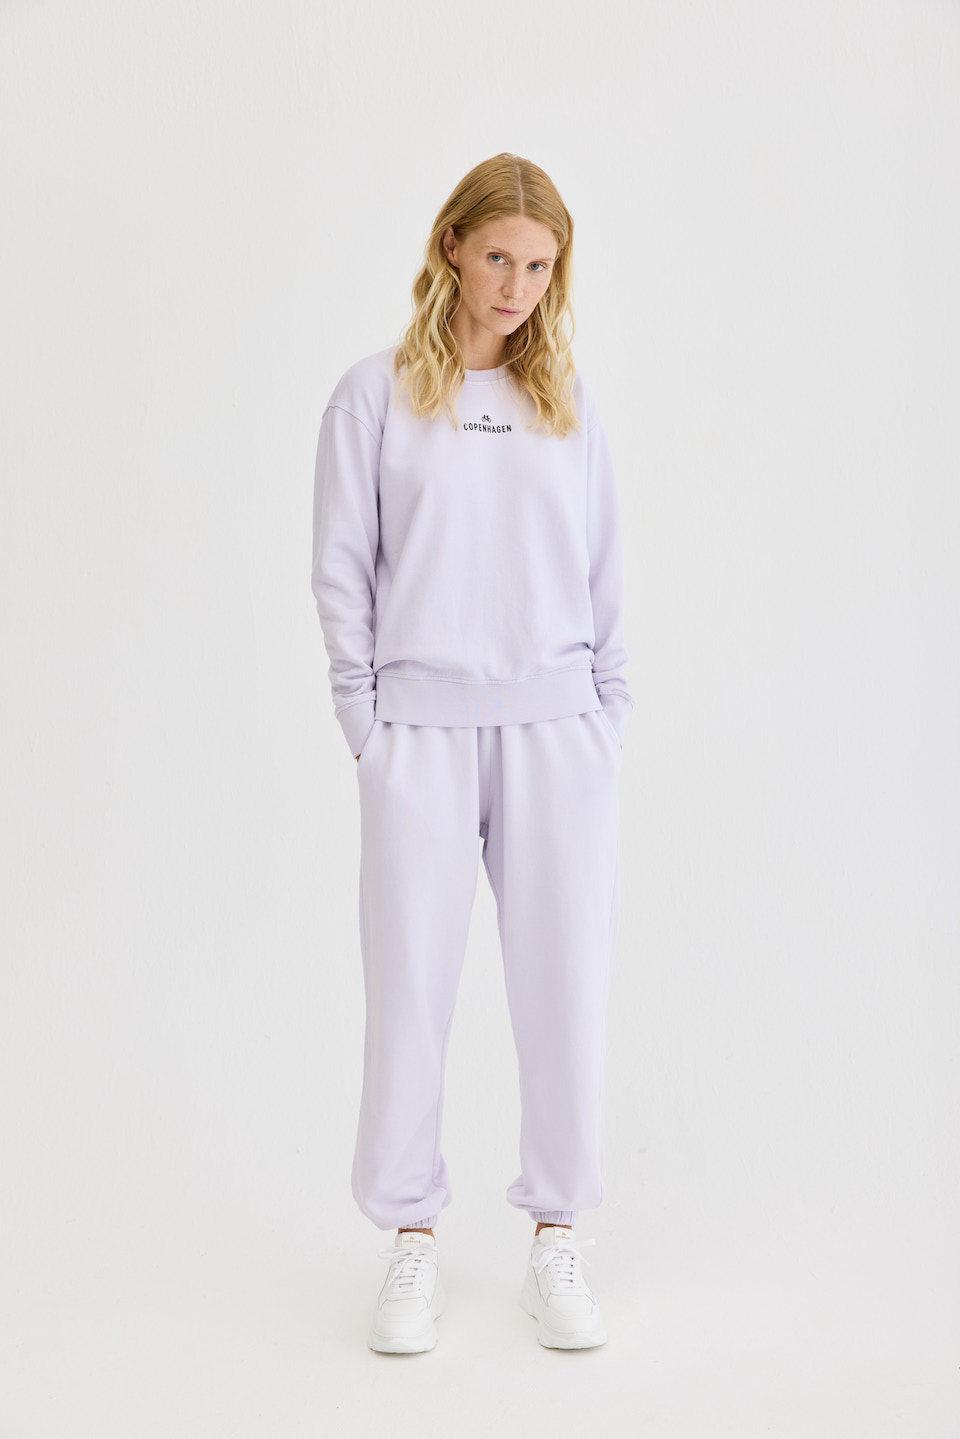 CPH Sweat 1 org. cotton lavender